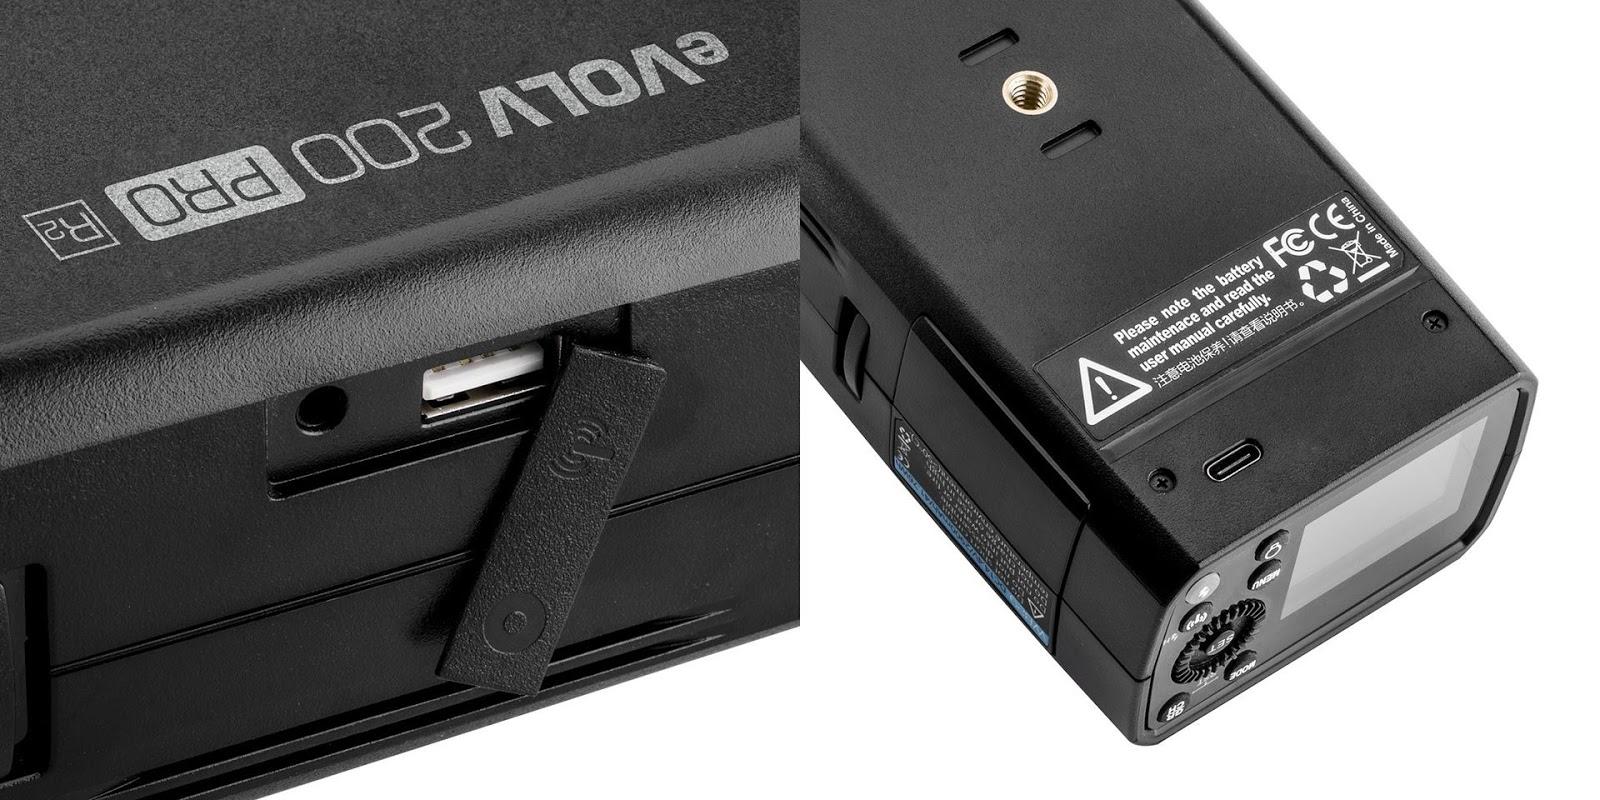 Разъемы на корпусе Flashpoint eVOLV 200 Pro (Godox AD200 Pro)